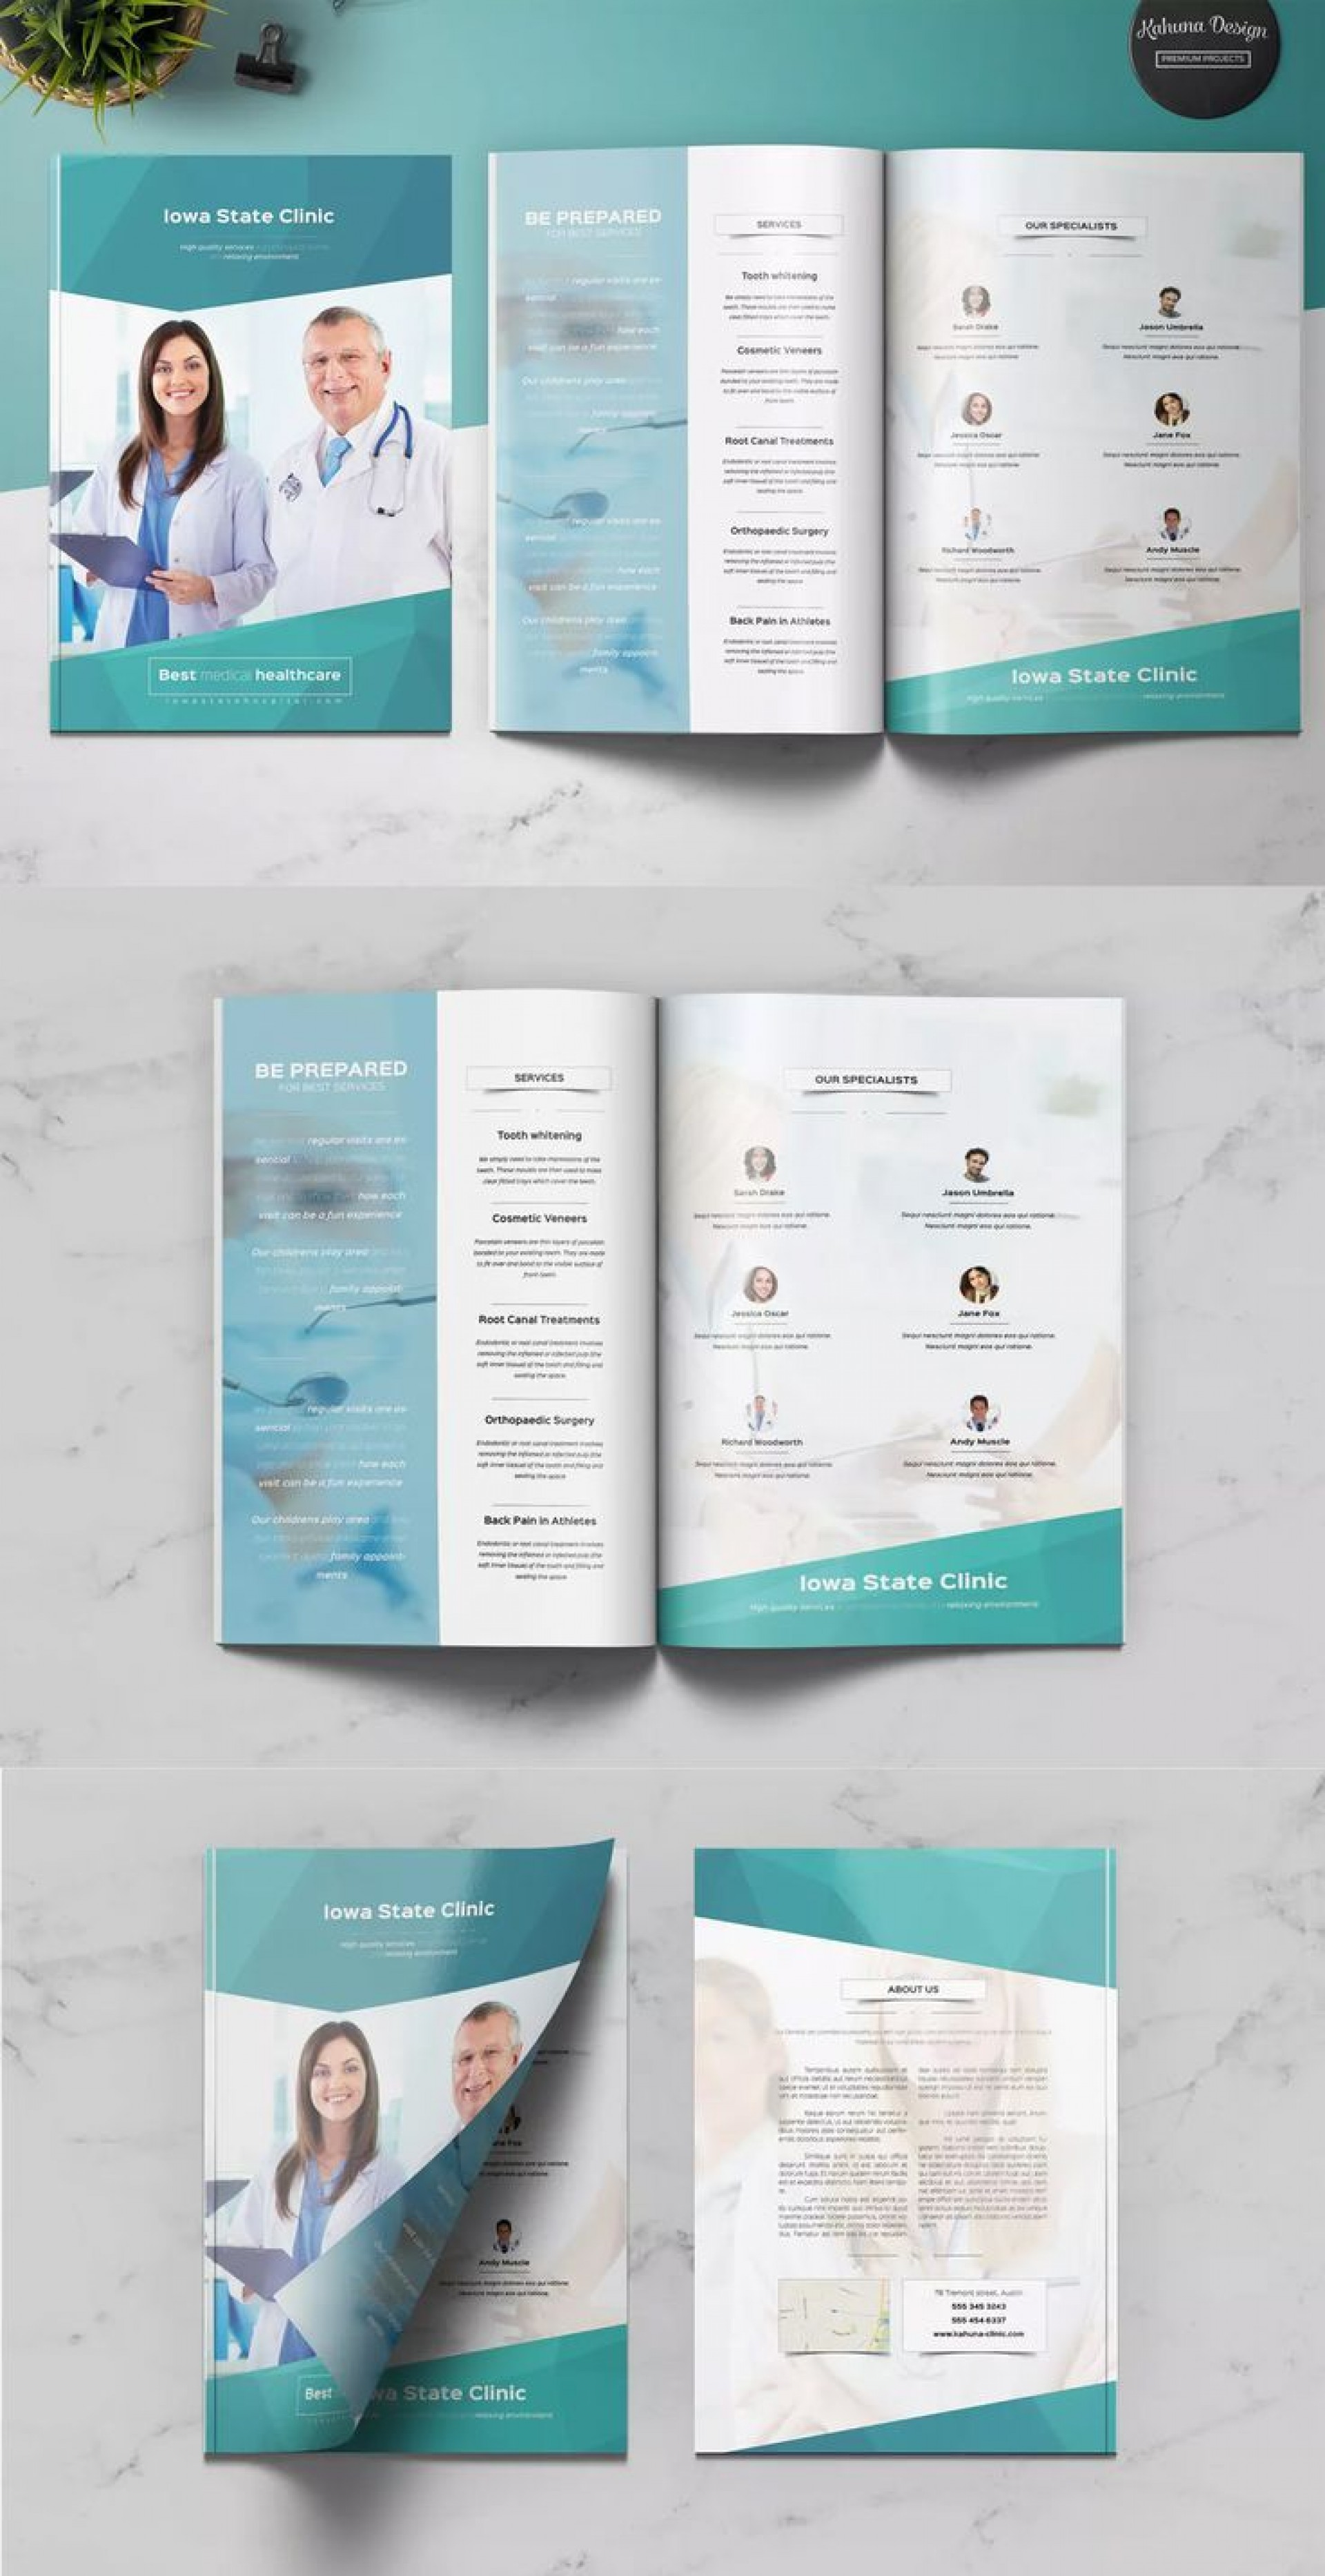 001 Unbelievable Word Tri Fold Brochure Template Inspiration  2010 Microsoft M Office1920